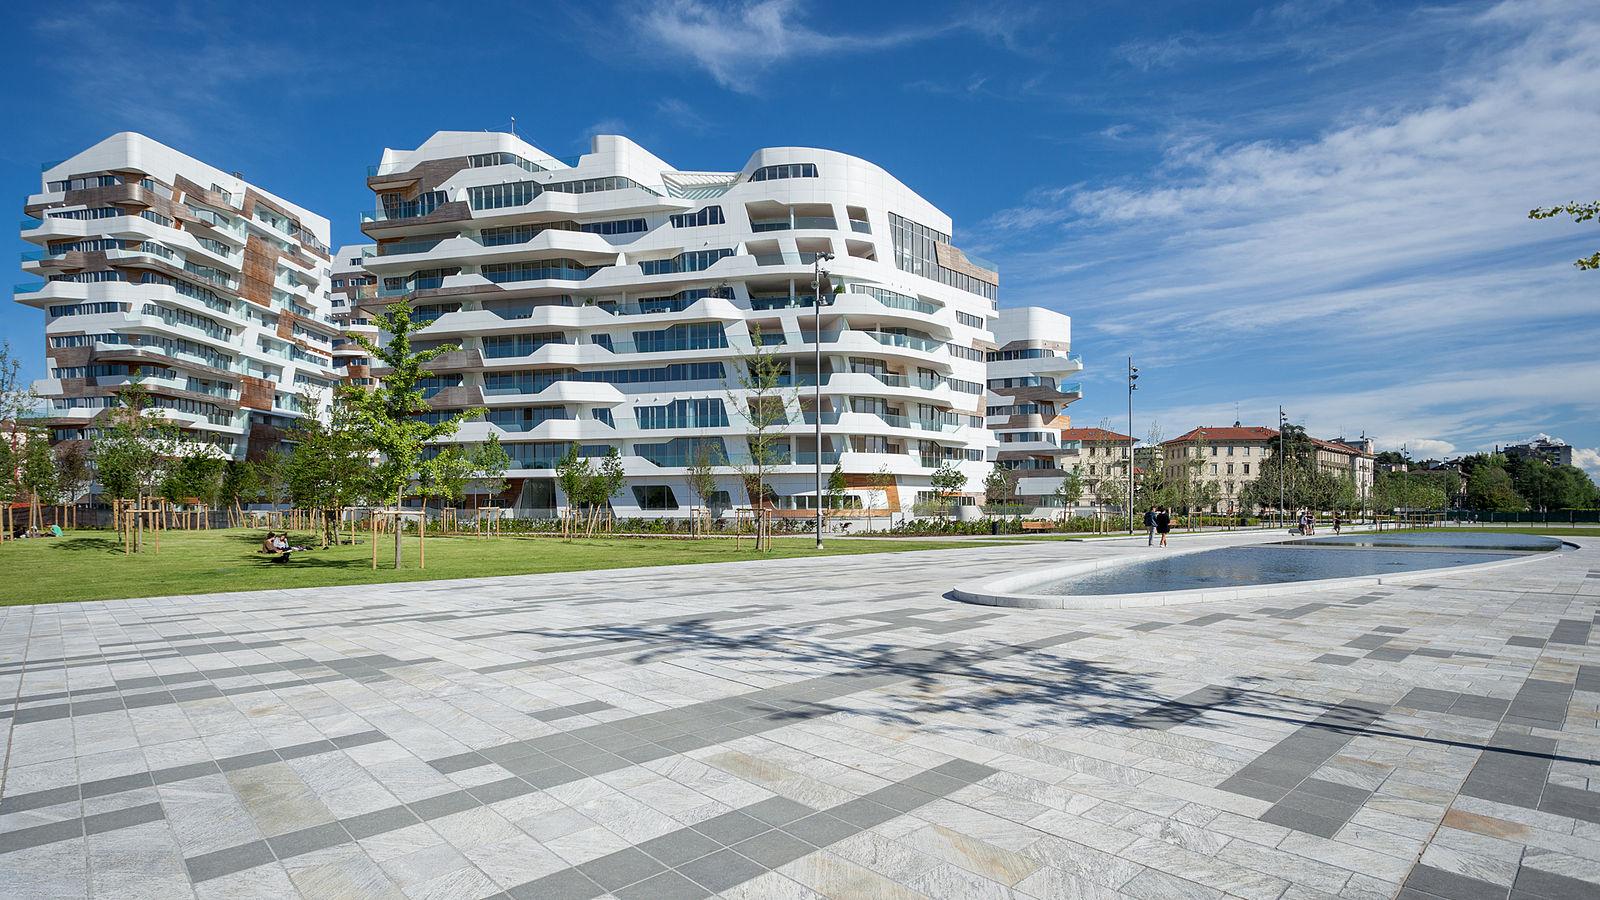 Il complesso residenziale Zaha Hadid